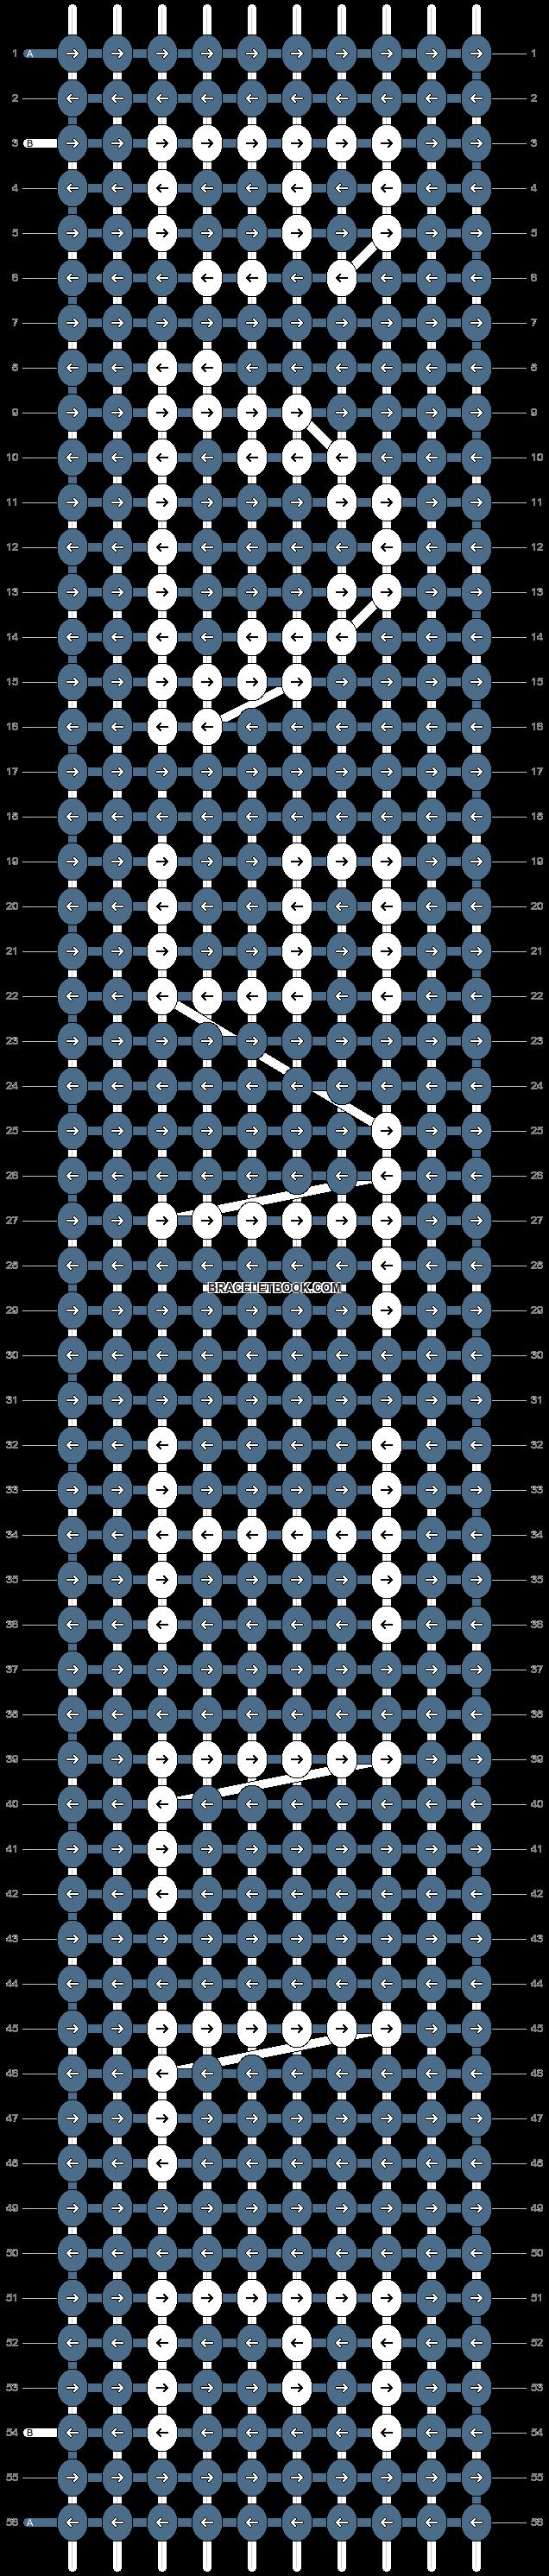 Alpha pattern #11958 pattern